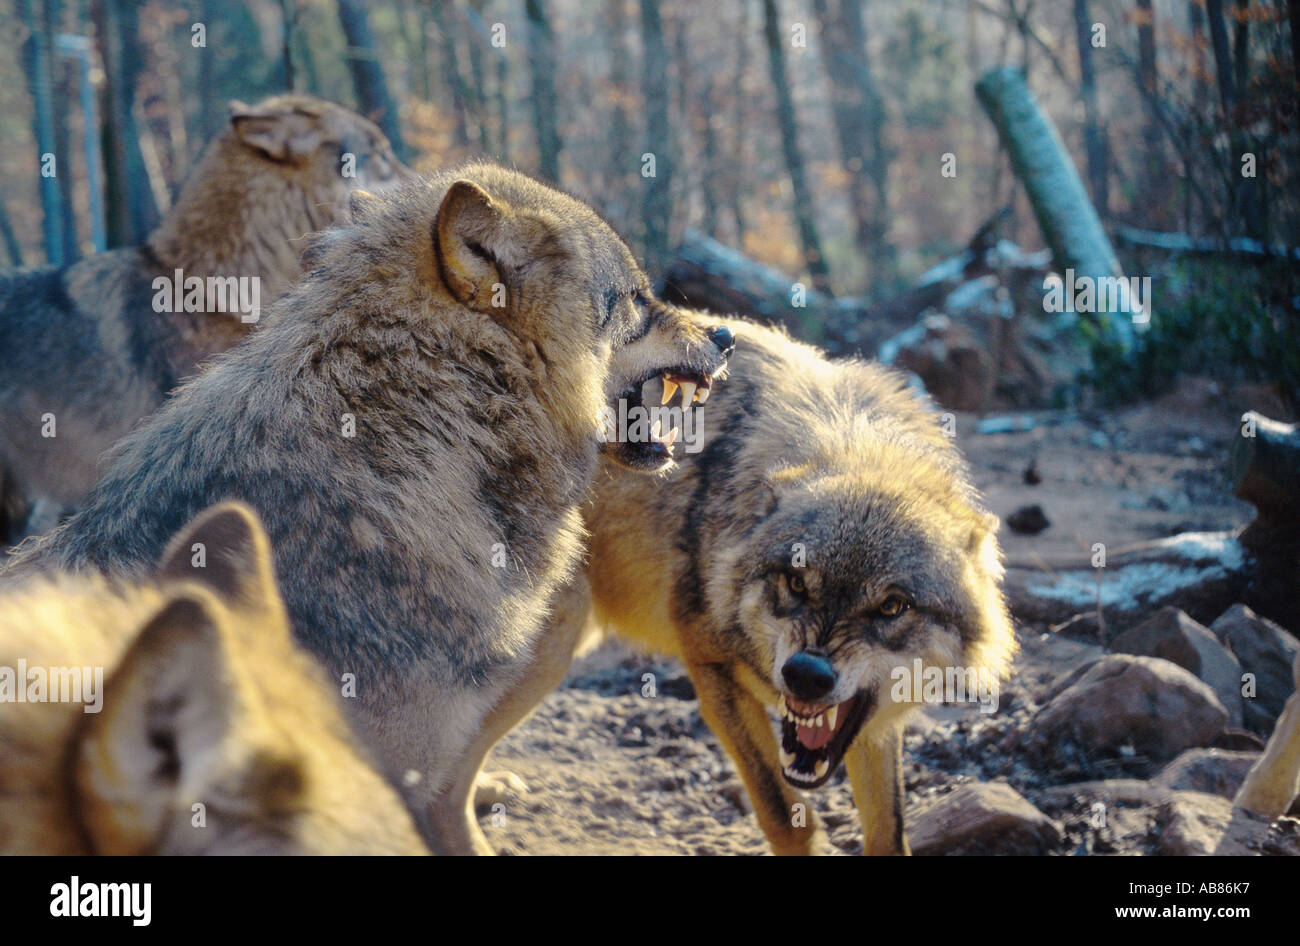 Eurpaischer Grauwolf (Canis lupus lupus) | Matthias Kahrs | Flickr